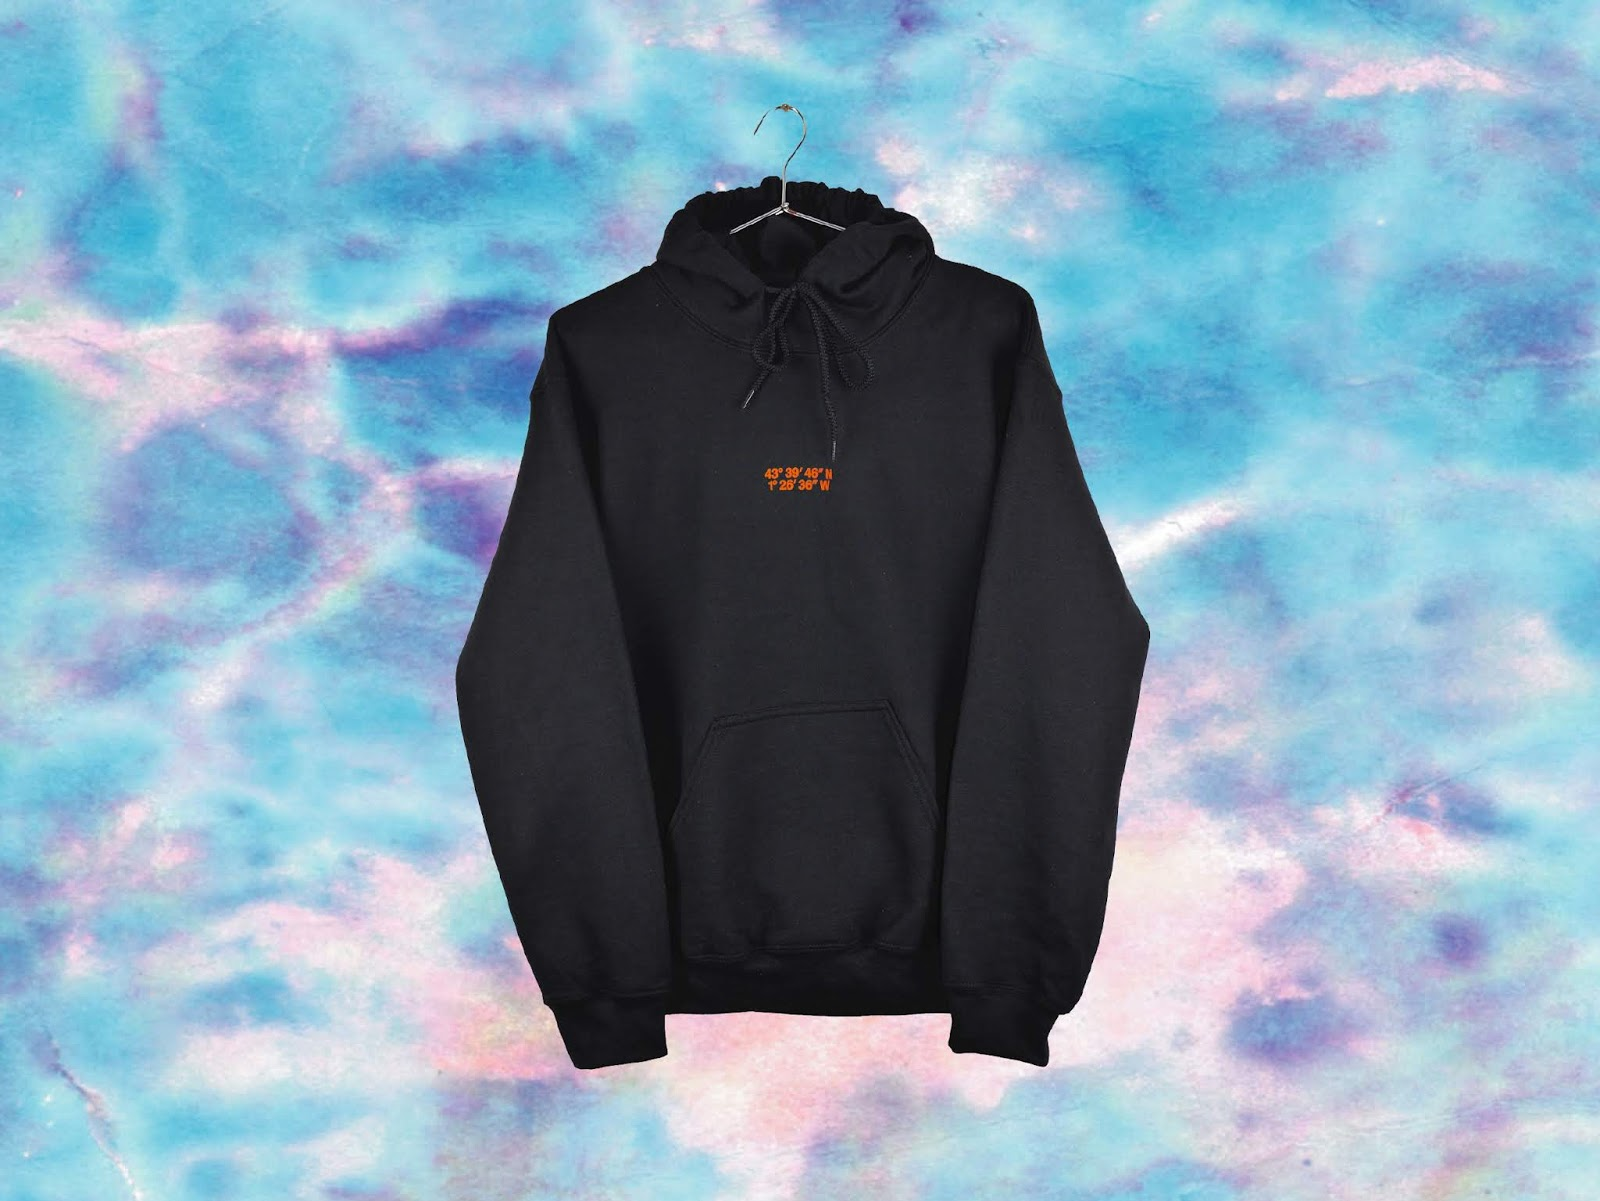 Surfinestate surf culture brand shop apparel coordinates hoodie logo minimalism Hossegor France Vincent Lemanceau Arthur Nelli